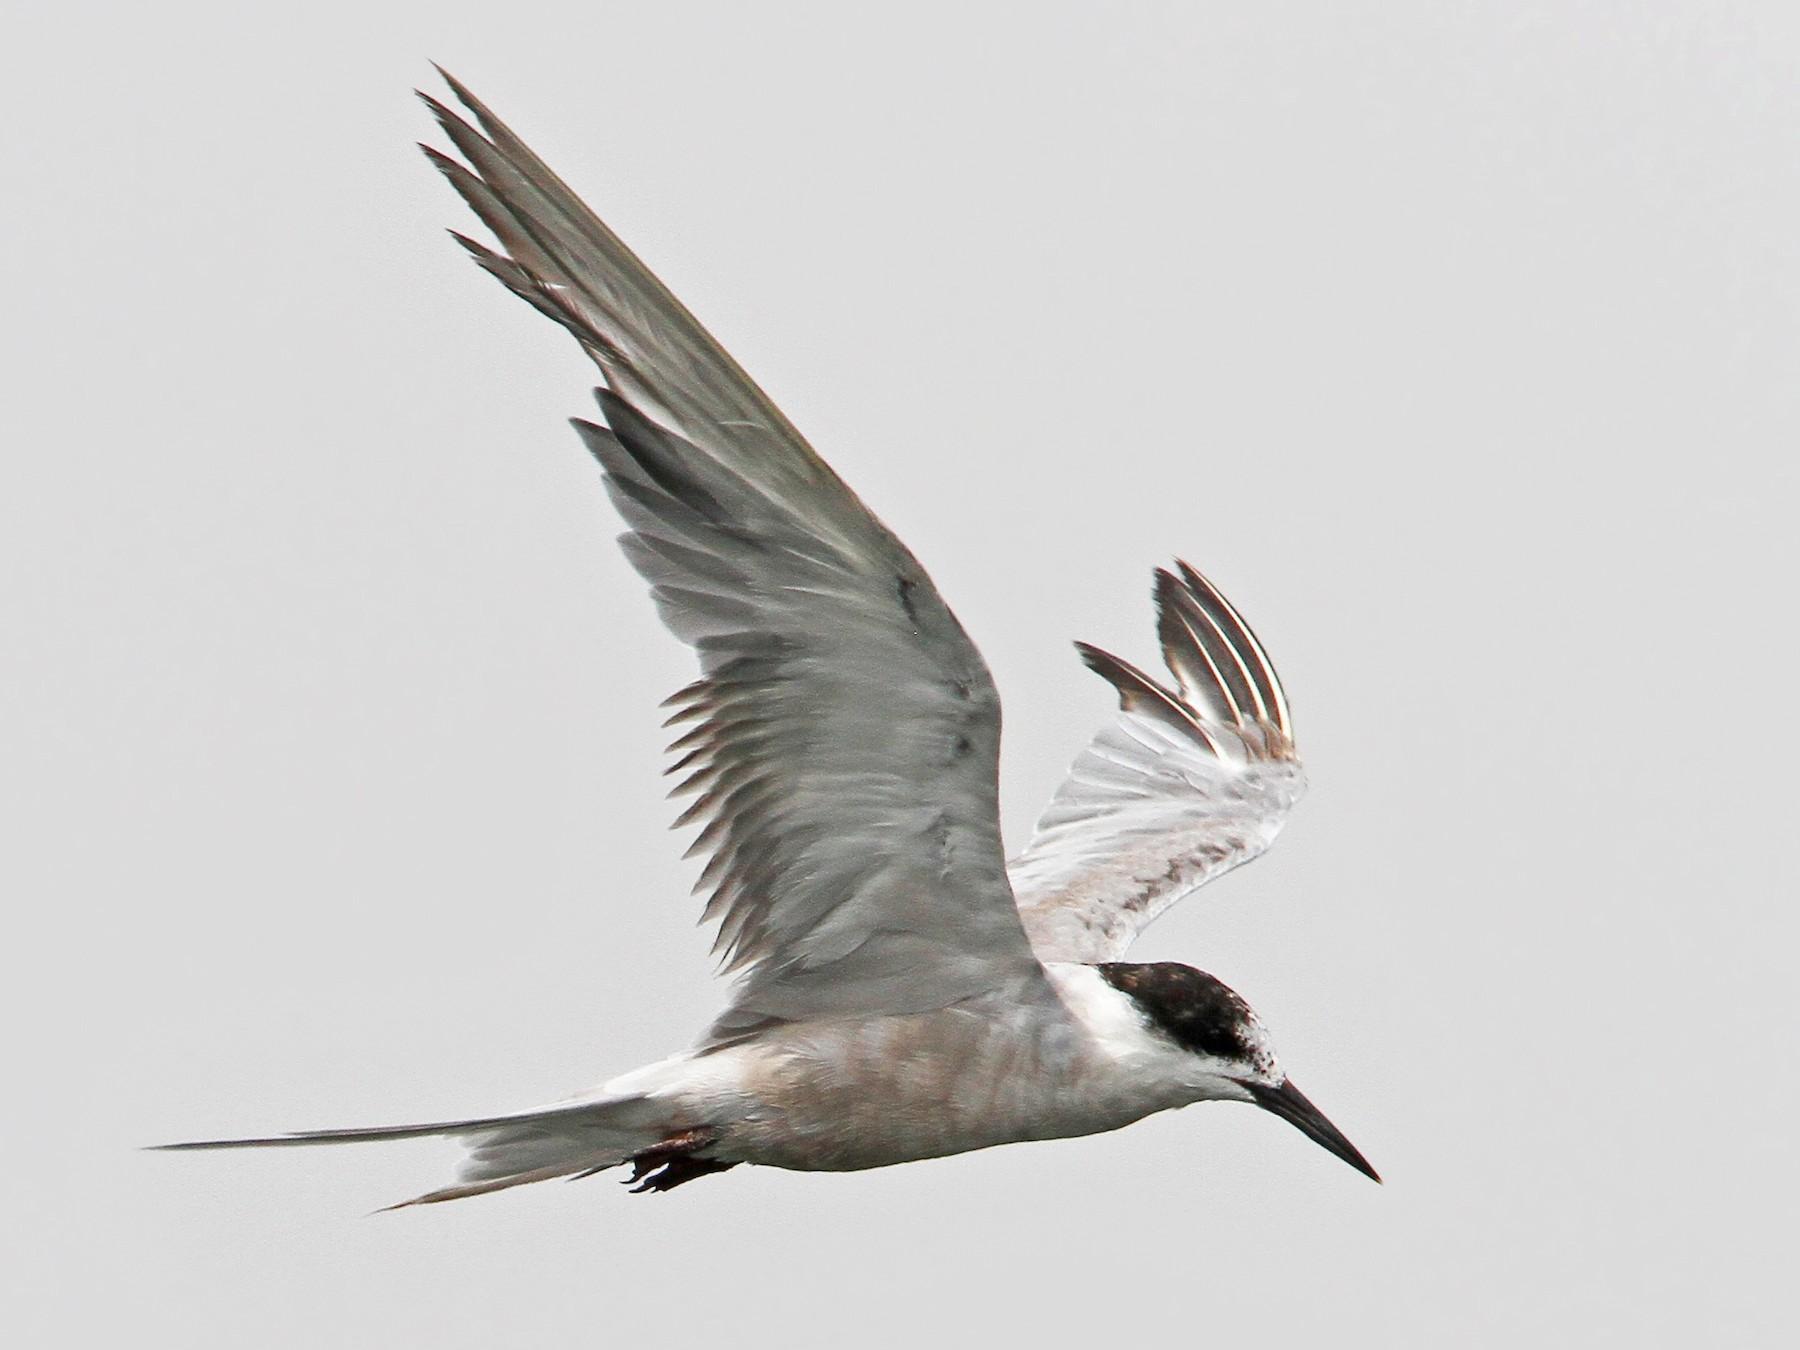 White-cheeked Tern - Christoph Moning